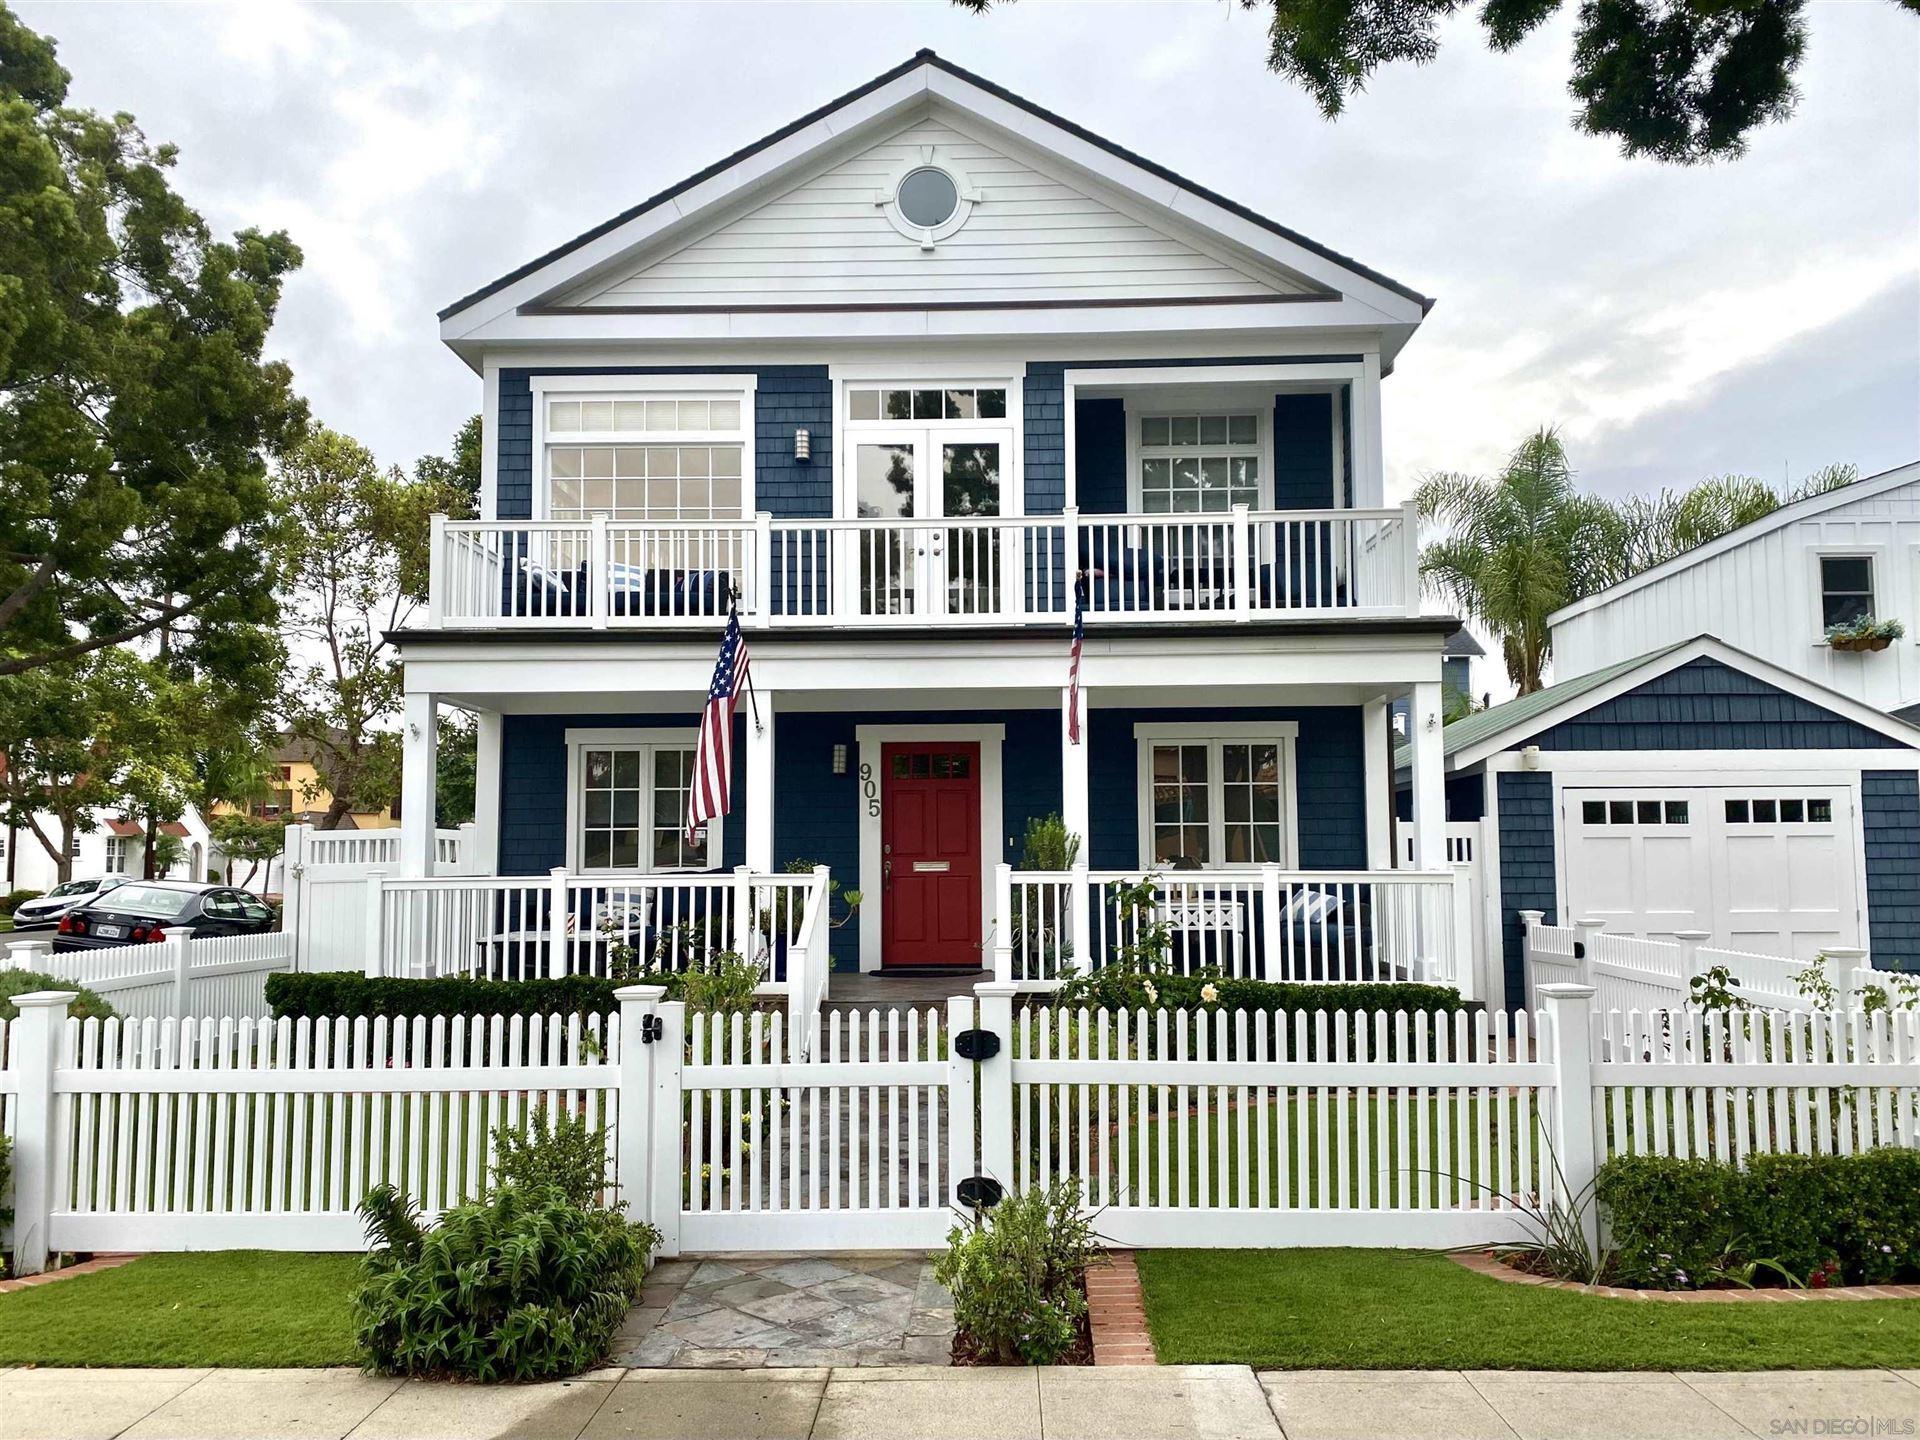 Photo of 905 J Ave, Coronado, CA 92118 (MLS # 210028401)